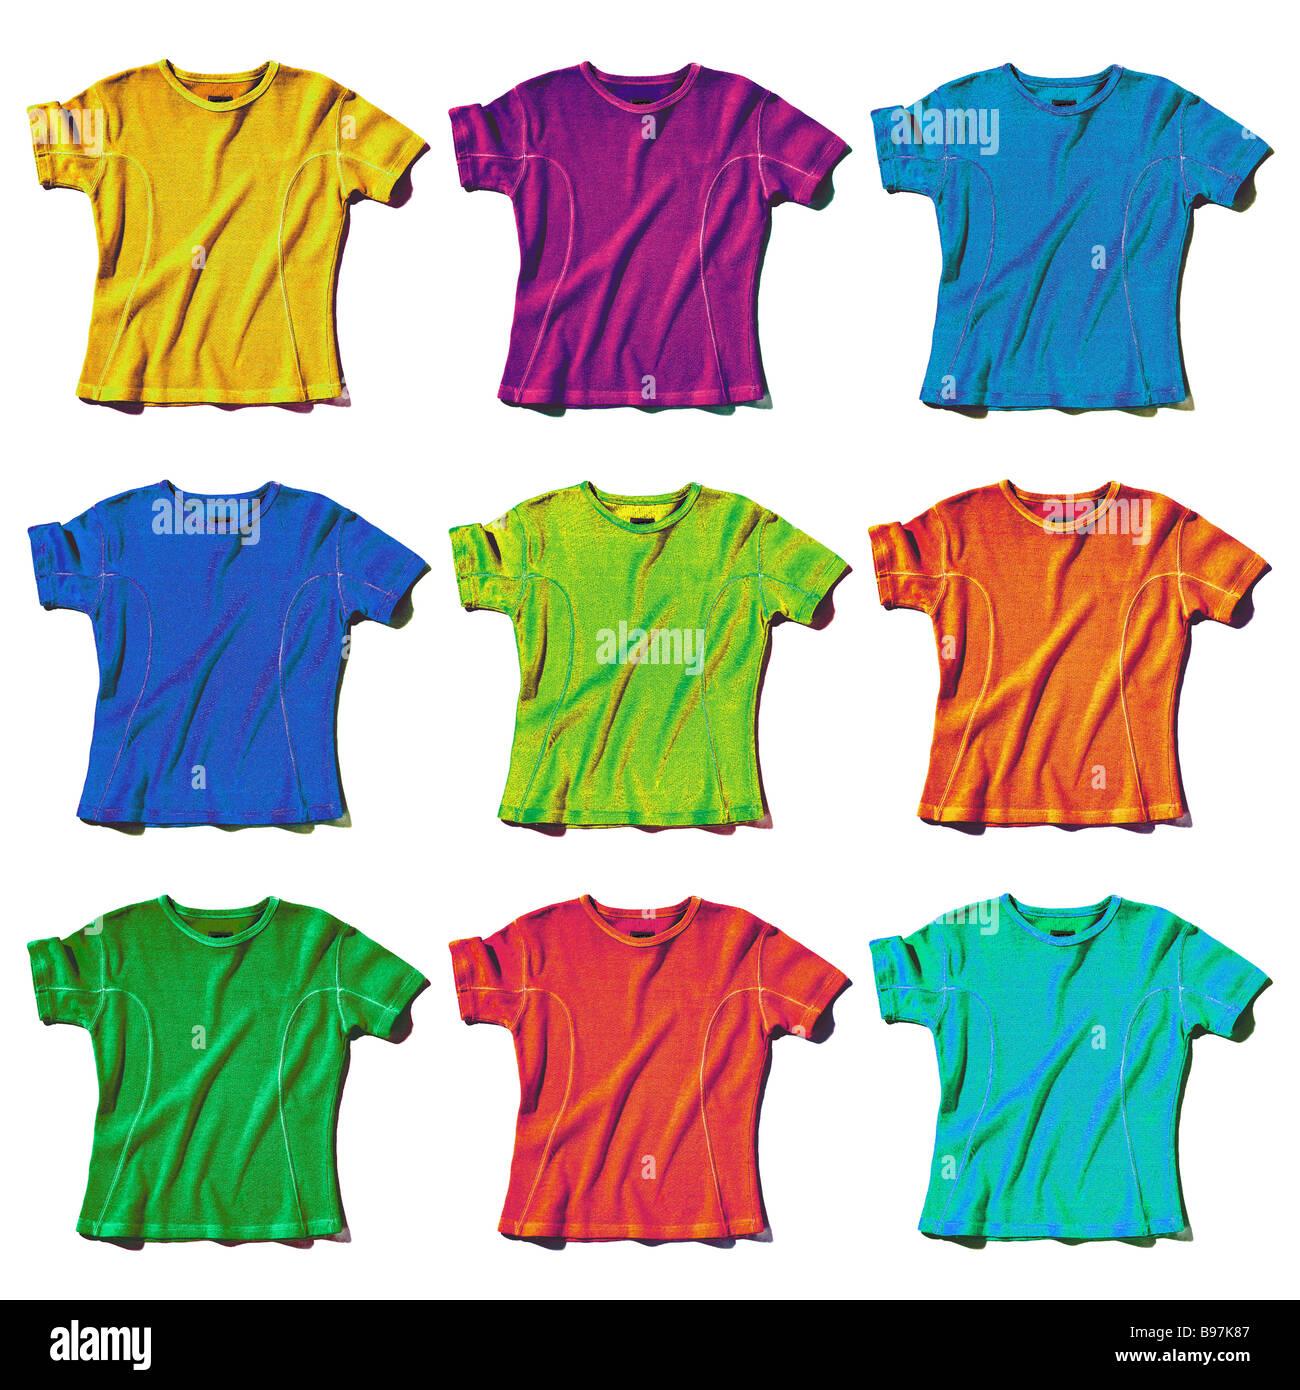 9 coloured t-shirts - Stock Image